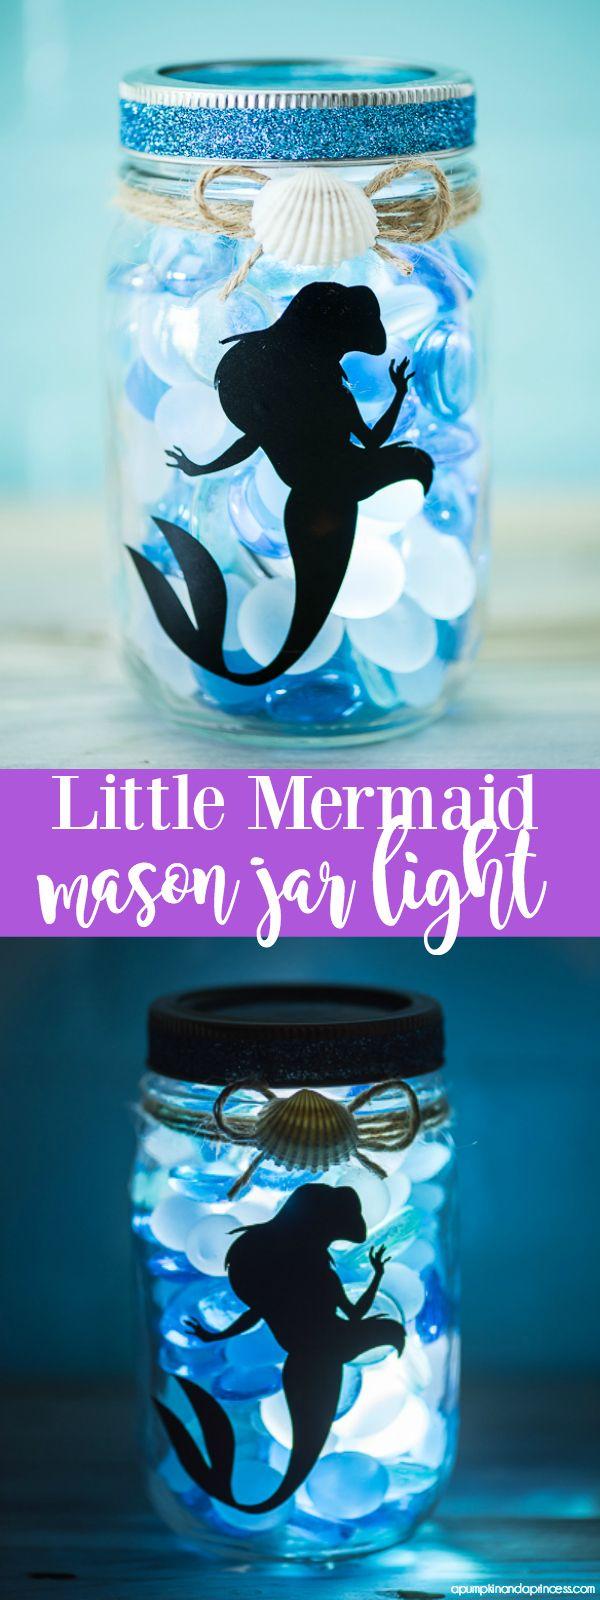 DIY Little Mermaid Mason Jar Light - Cricut projects - mermaid crafts - girls room ideas - DIY nightlight - make your own night light